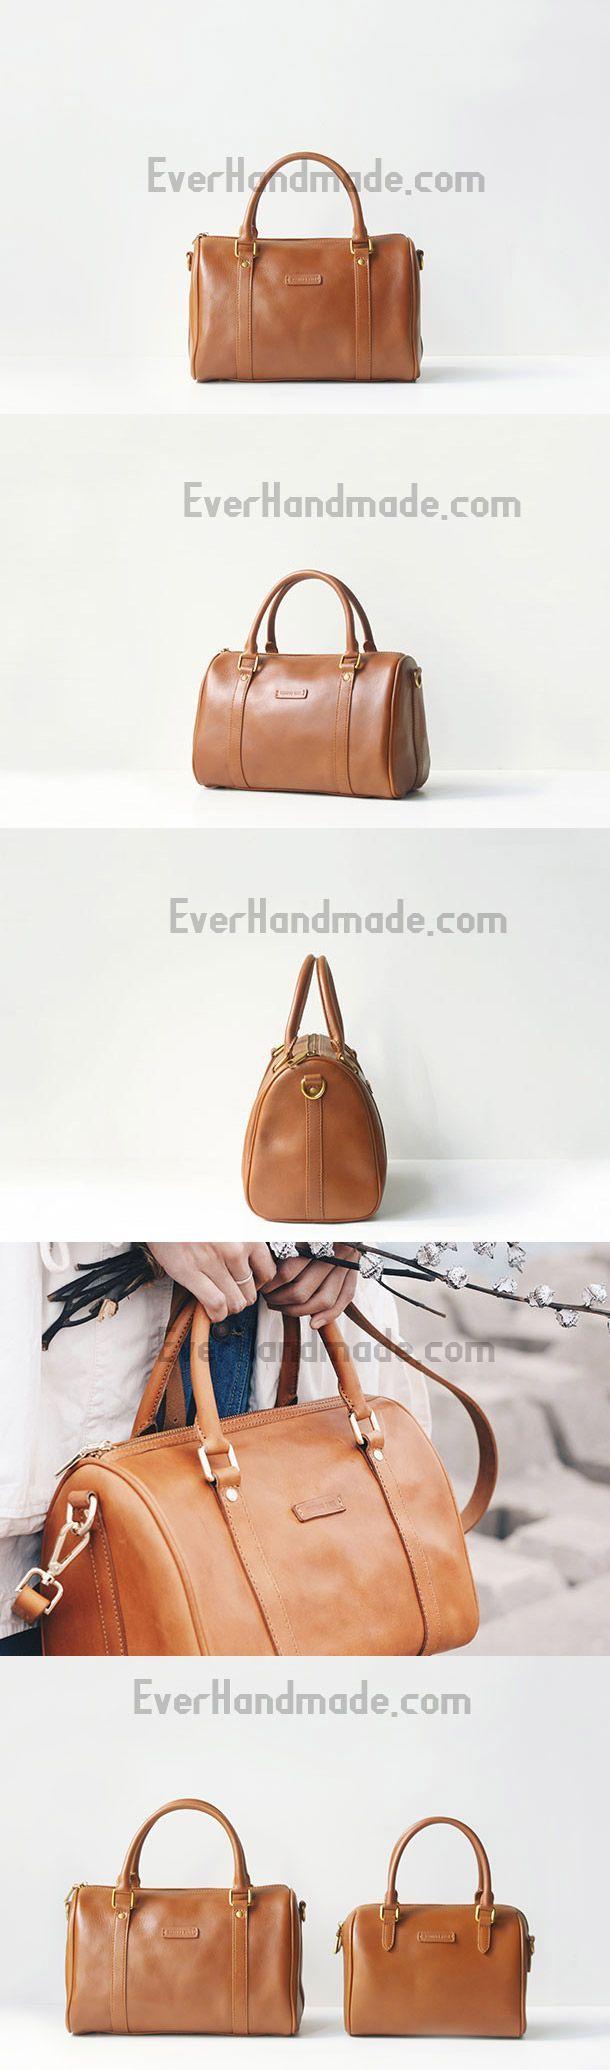 Handmade leather brown boston bag purse shoulder bag handbag #ShoulderBags